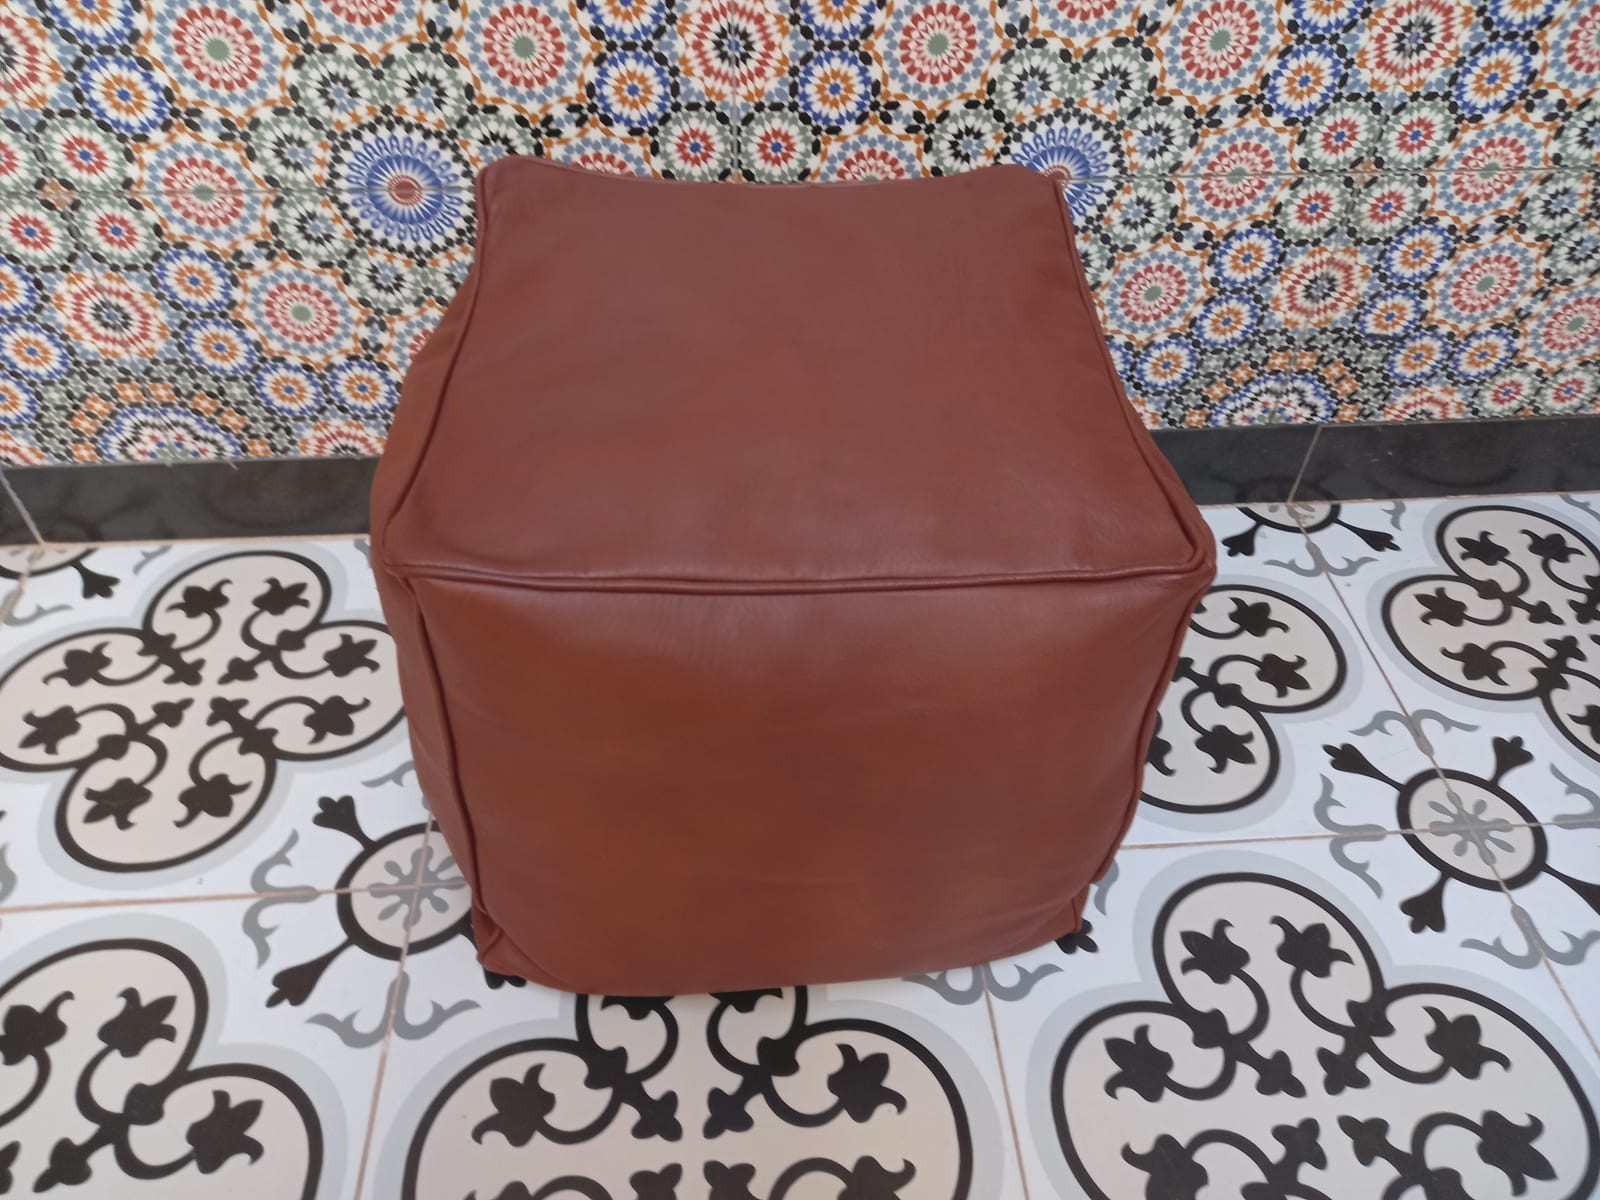 Pouf leather Orange Morocco